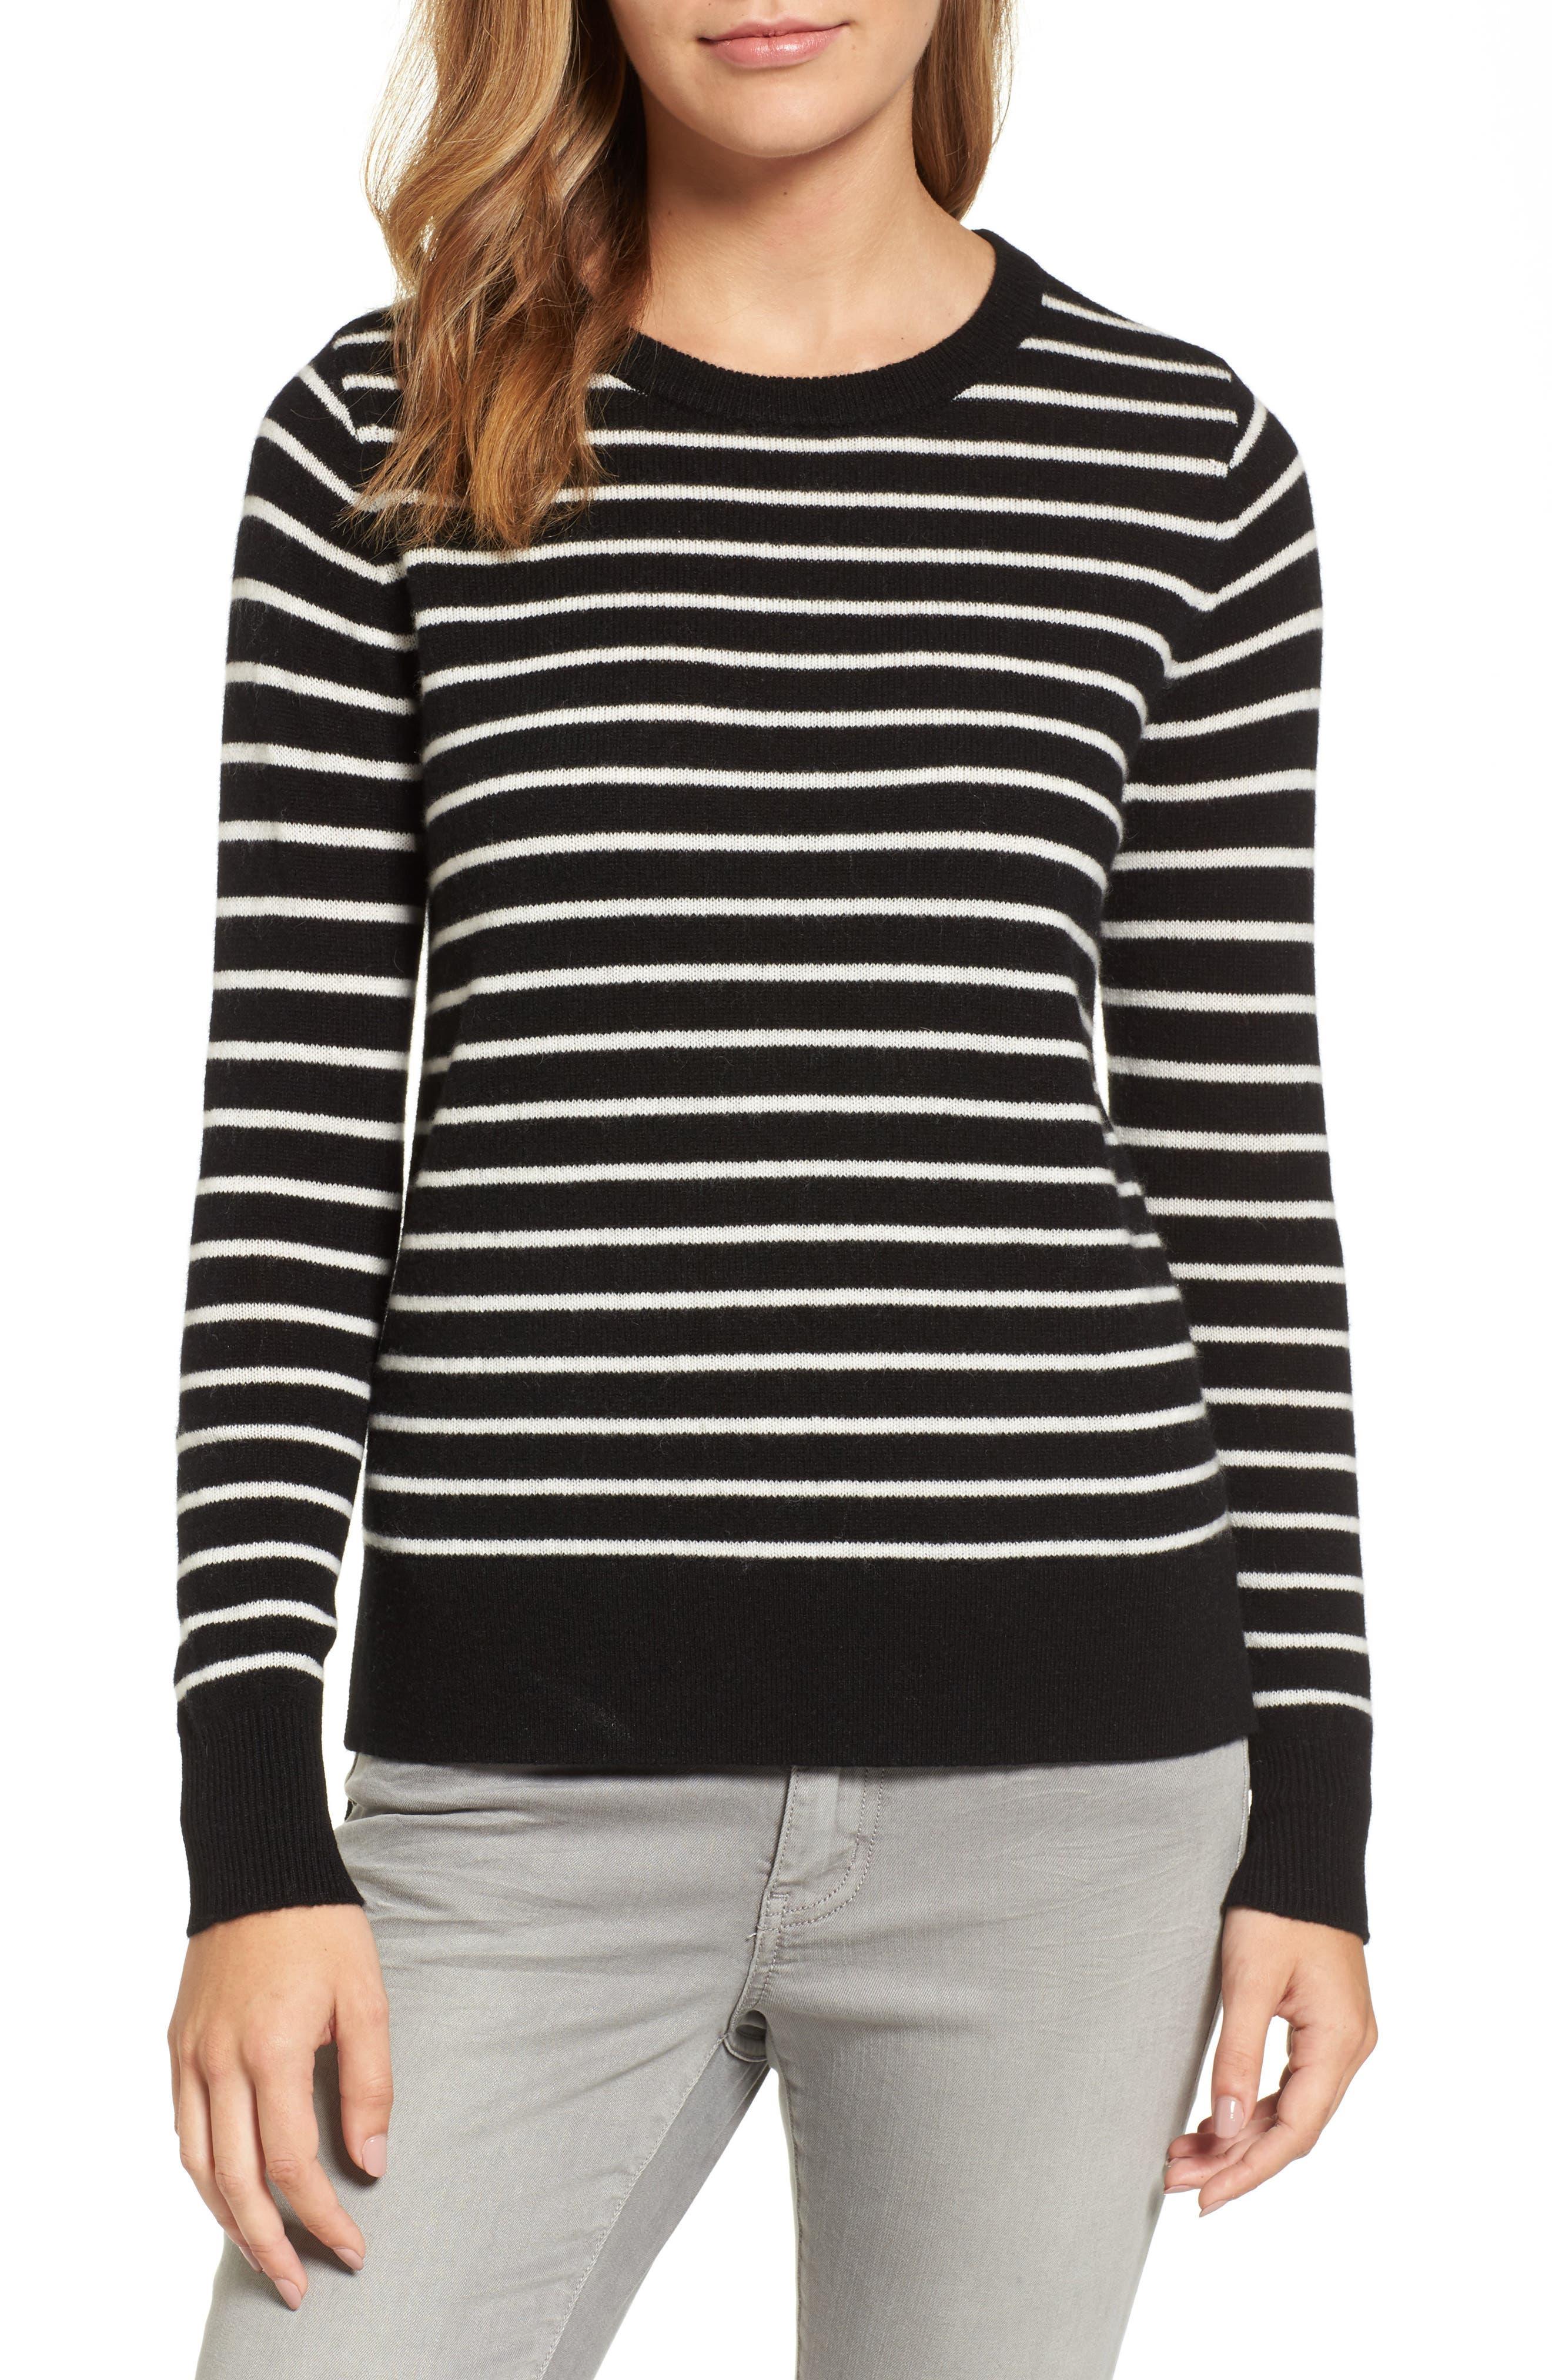 Alternate Image 1 Selected - Halogen® Crewneck Cashmere Sweater (Regular & Petite)